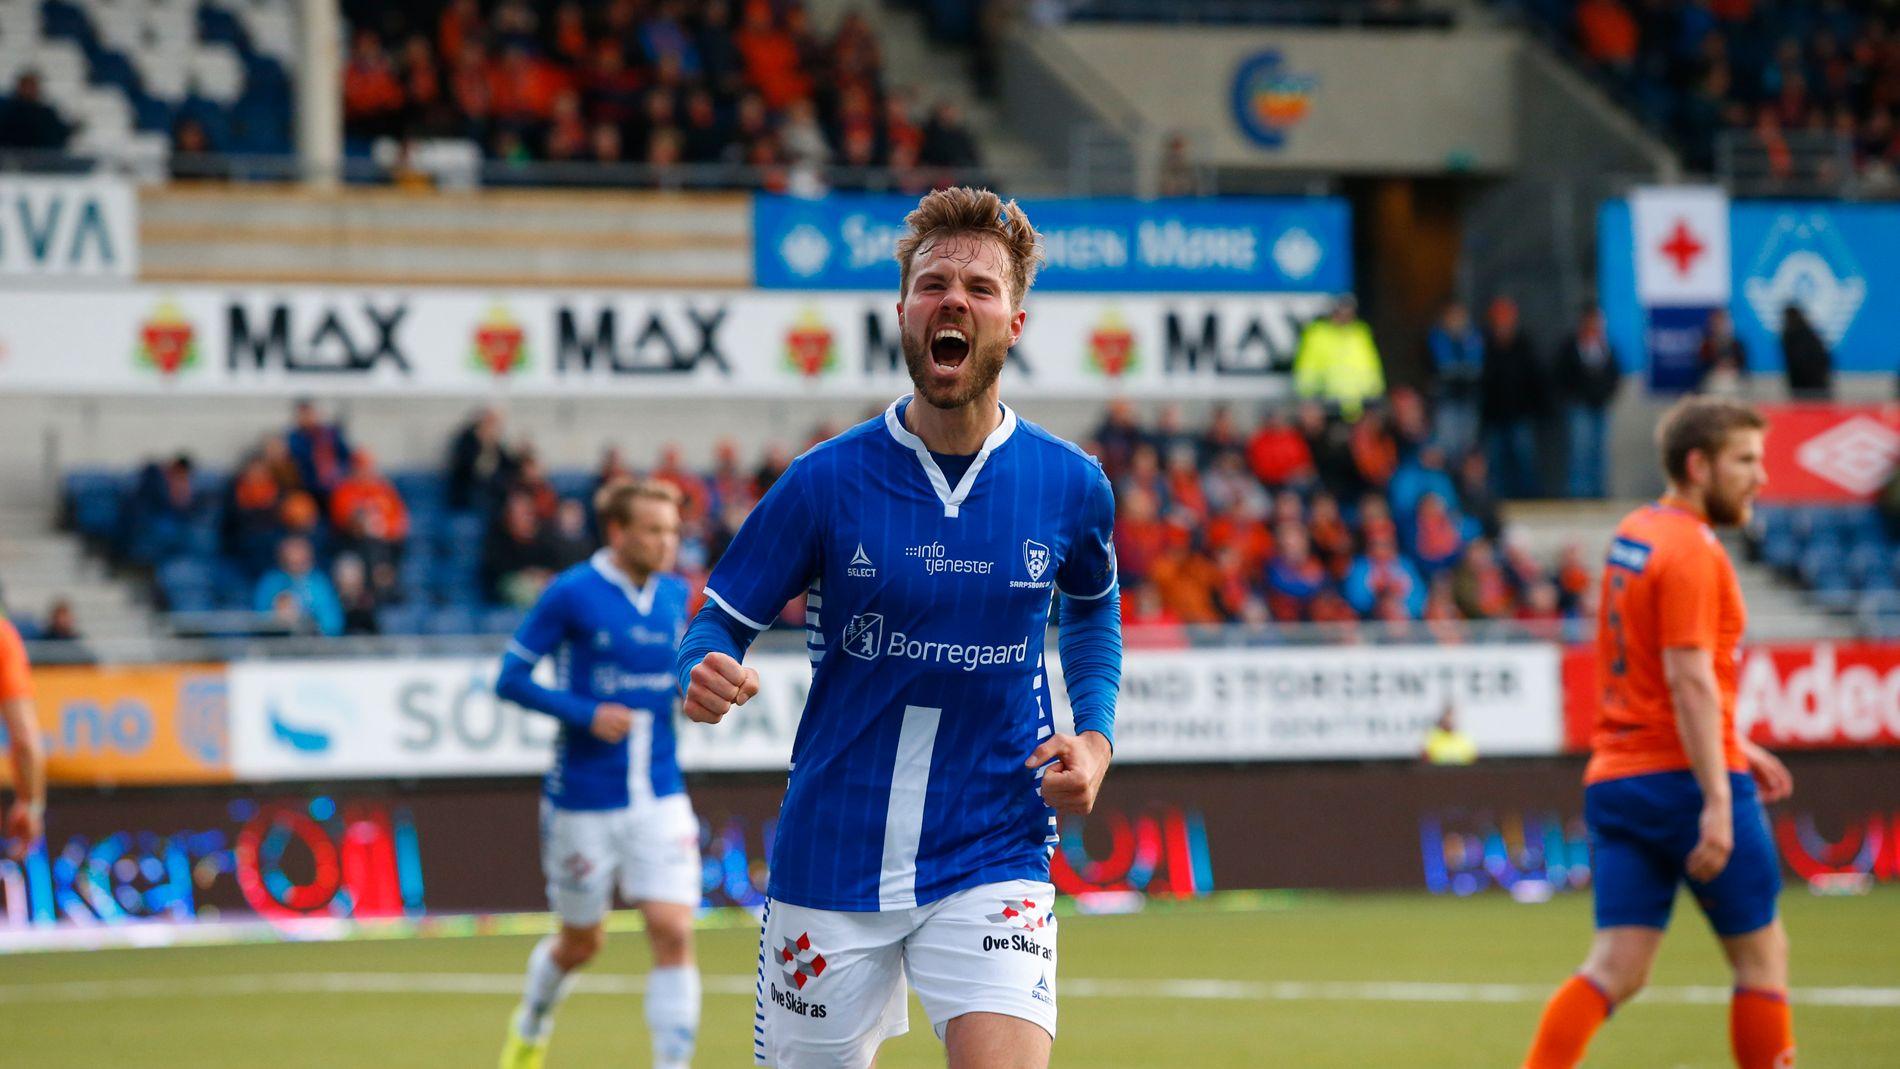 TOMÅLSSCORER: Patrick Mortensen kunne juble for to scoringer i 3-1-seieren mot Aalesund. Foto: Svein Ove Ekornesvåg / NTB scanpix